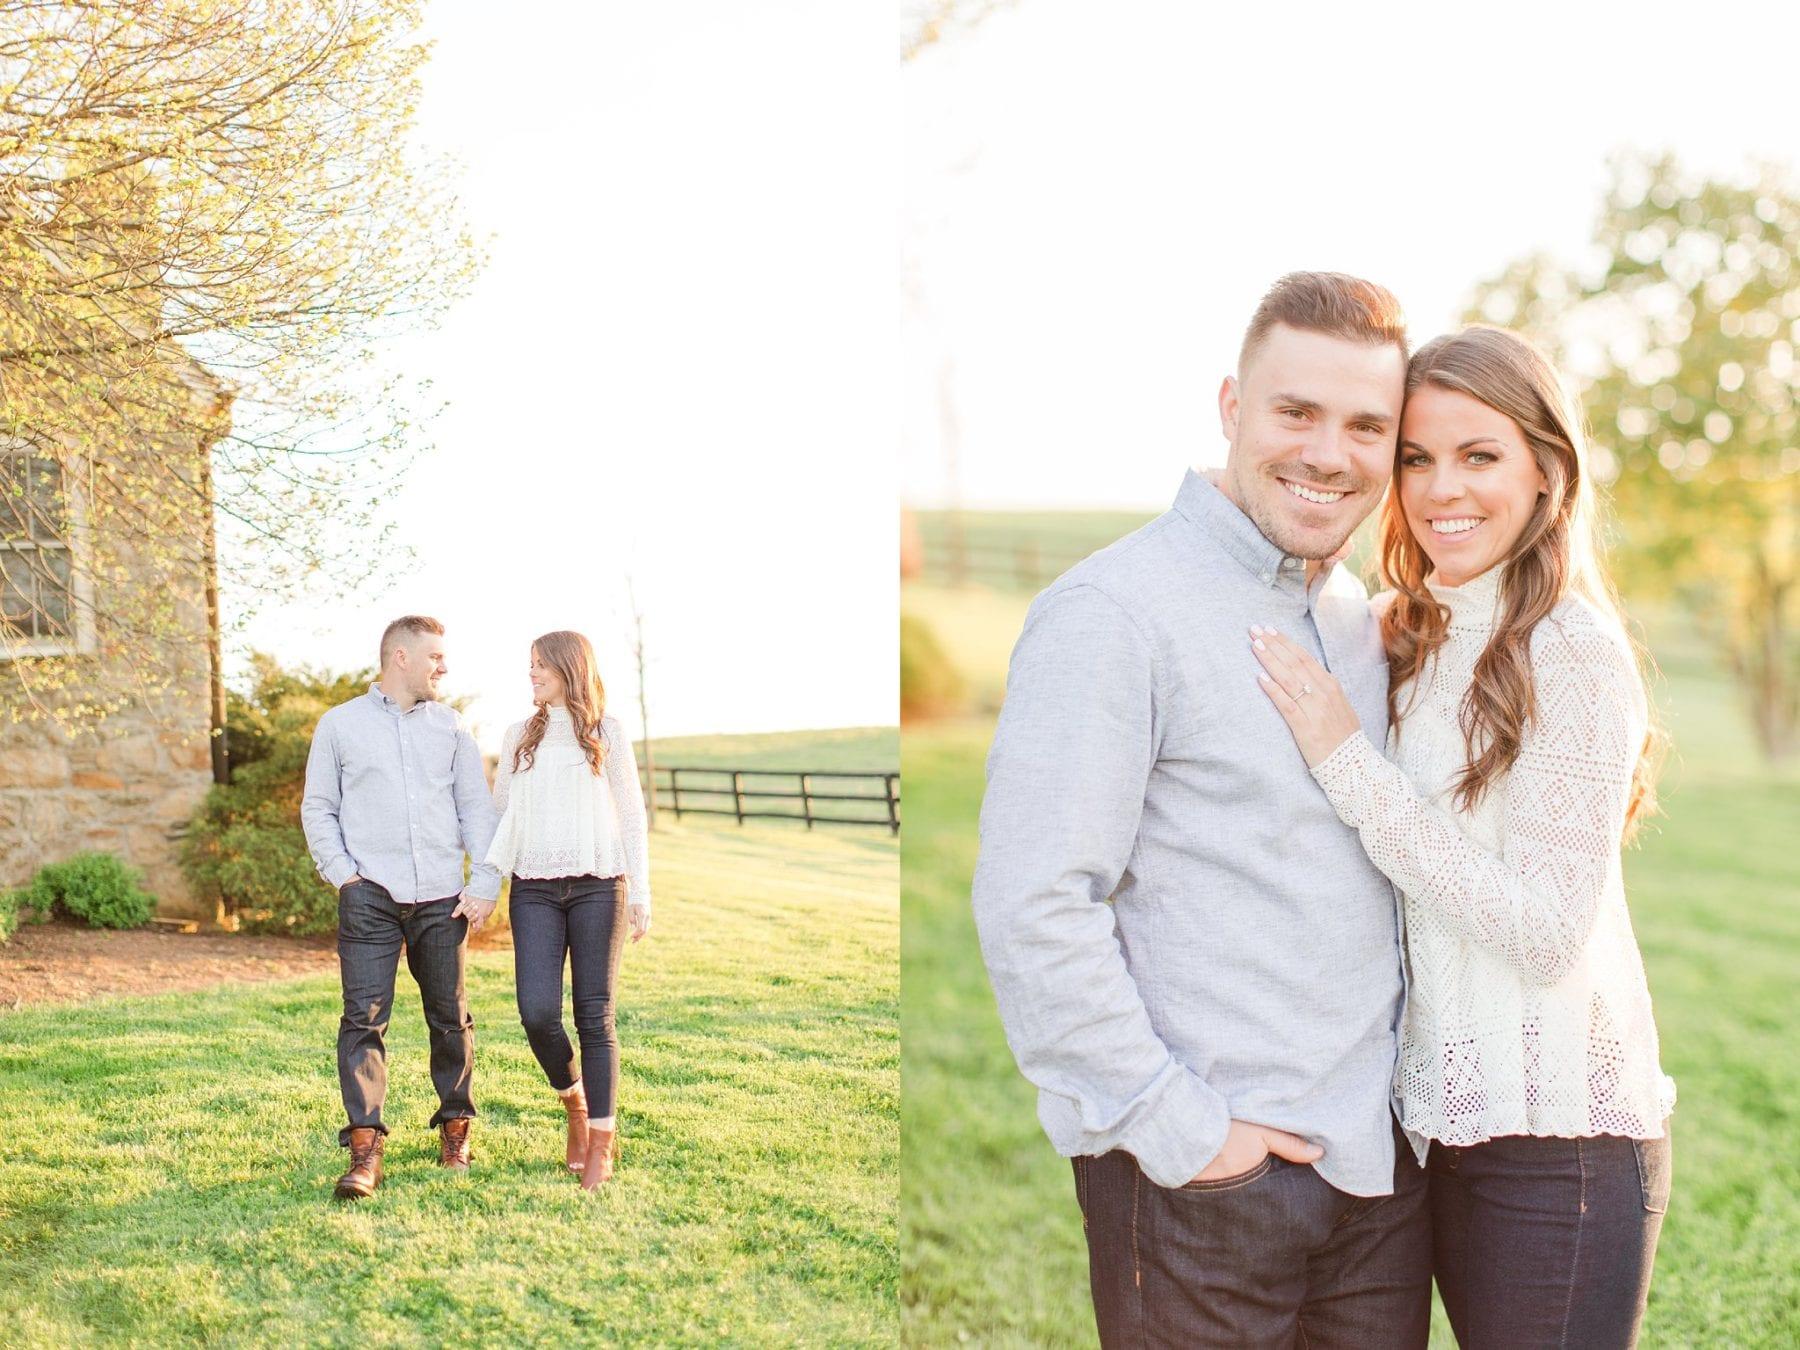 Goodstone Inn Engagement Session Virginia Wedding Photographer Megan Kelsey Photography-257.jpg